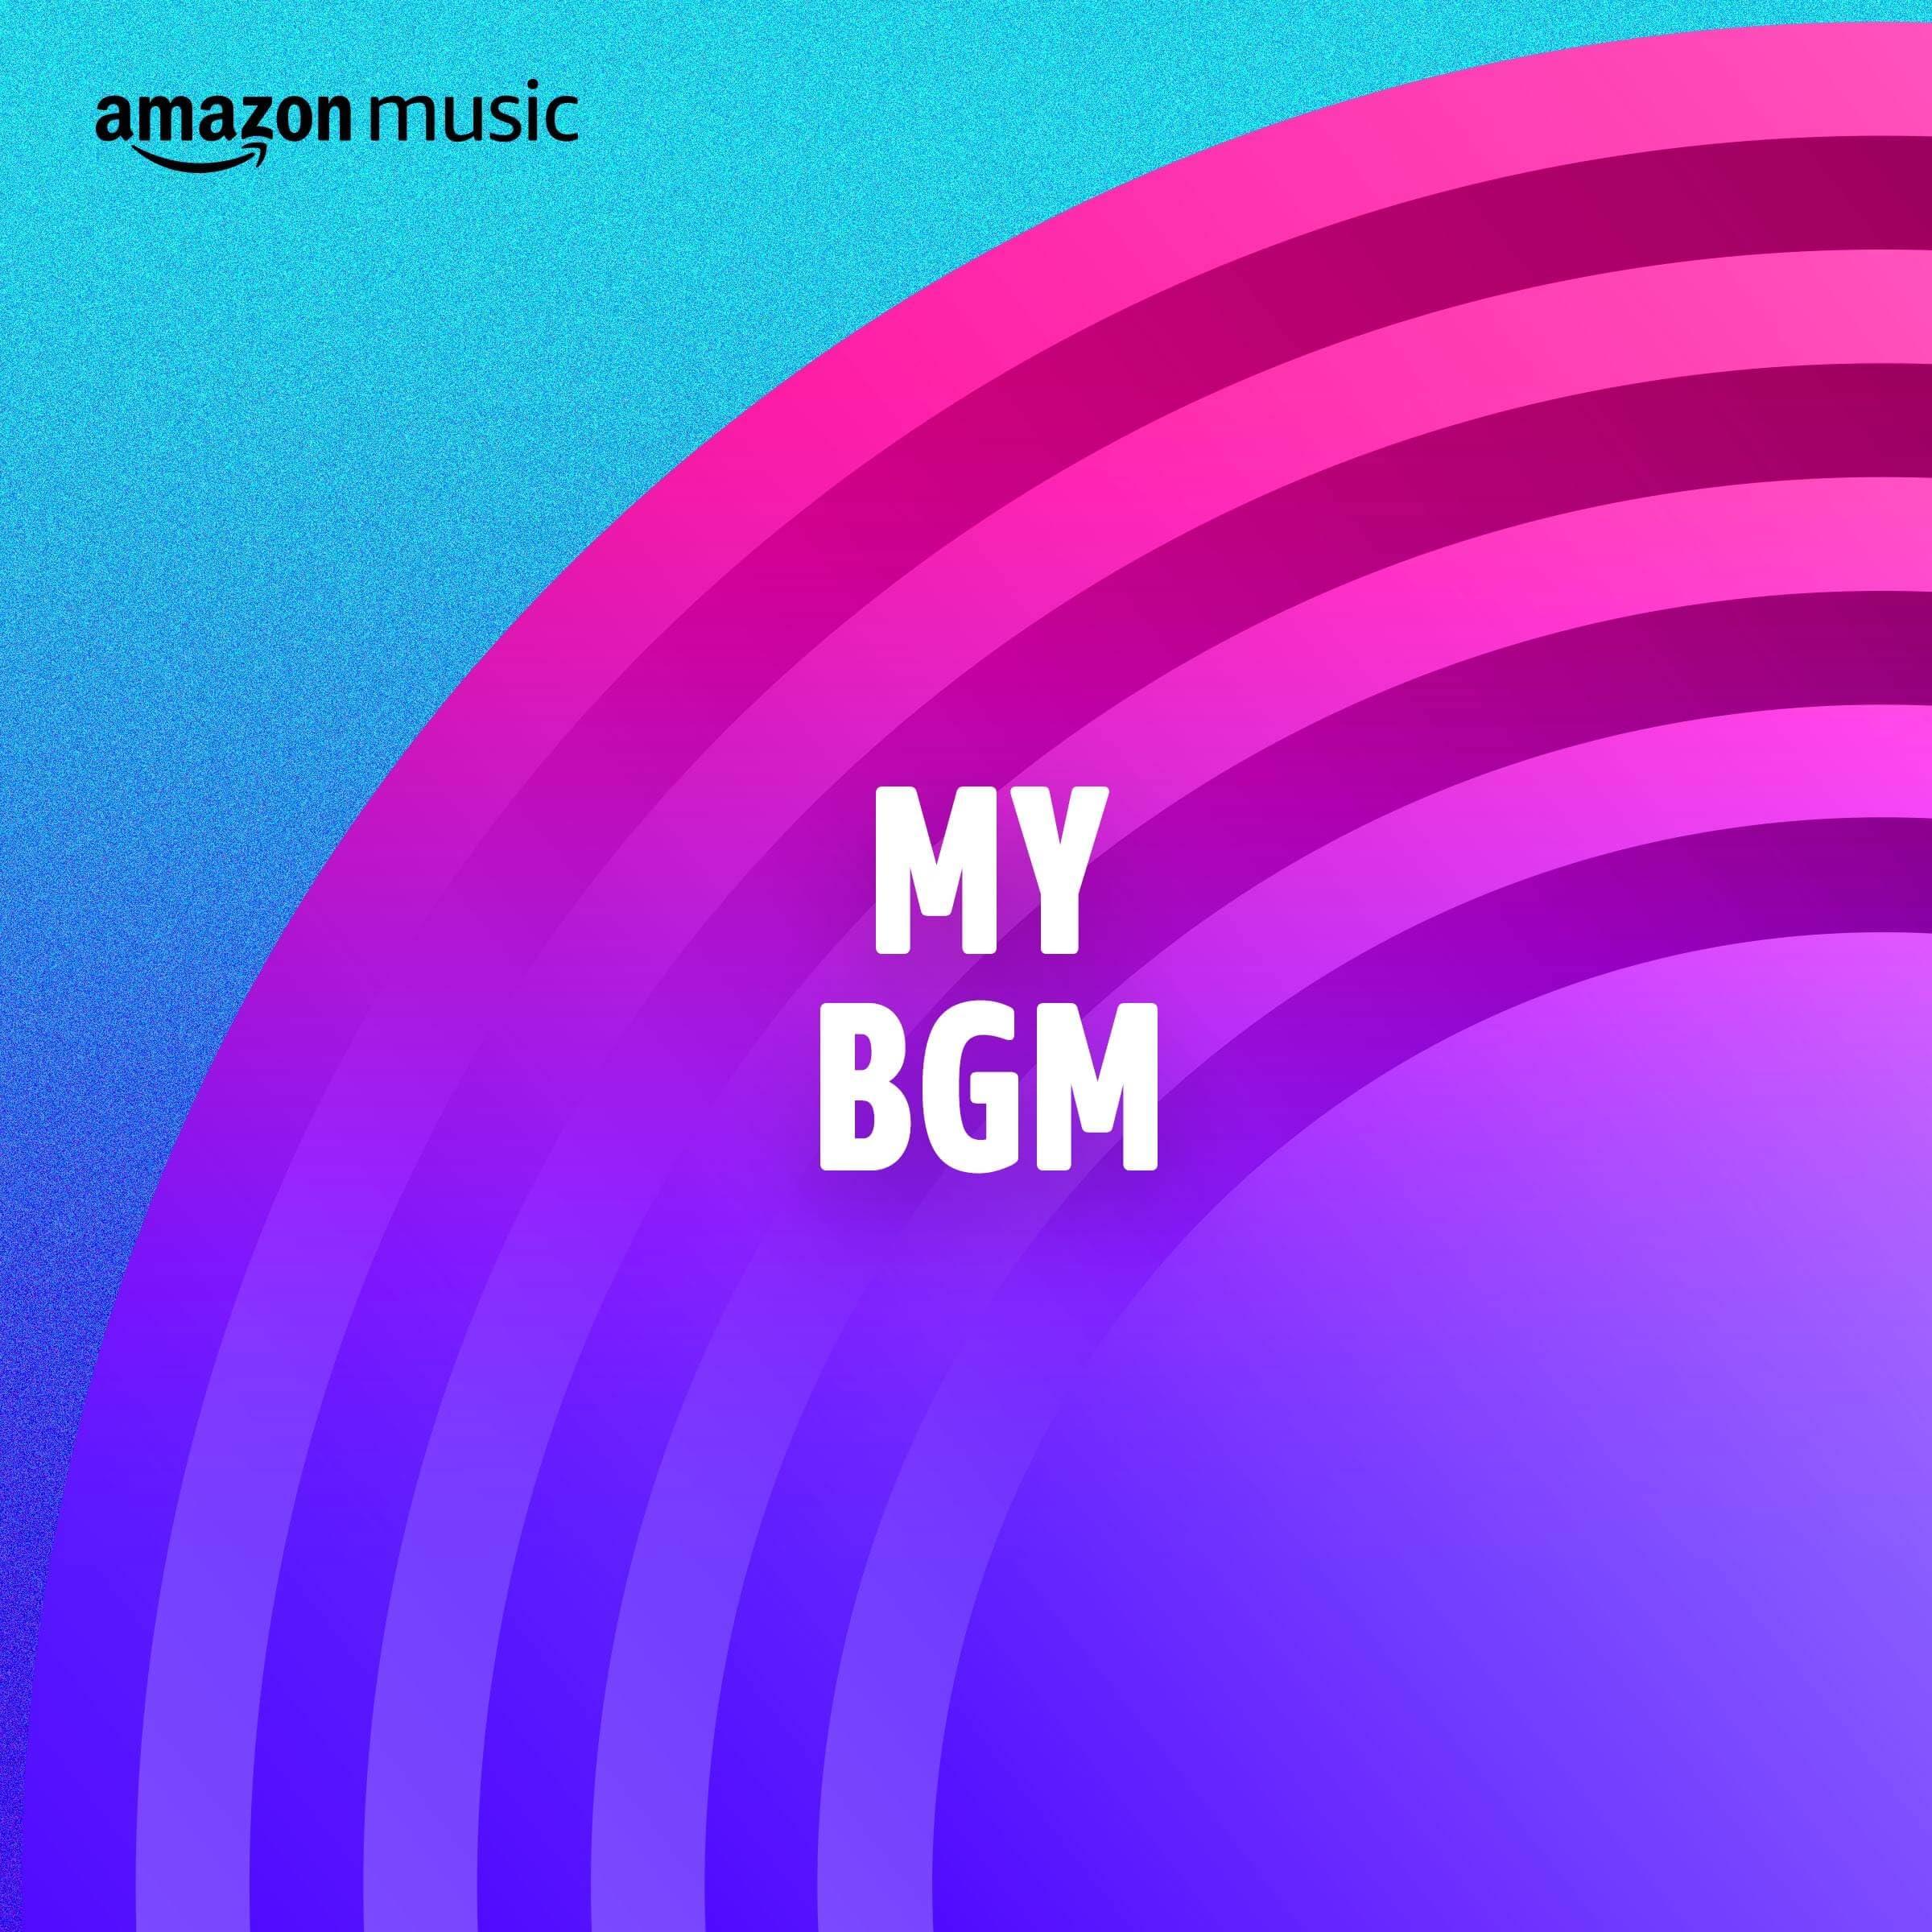 My BGM